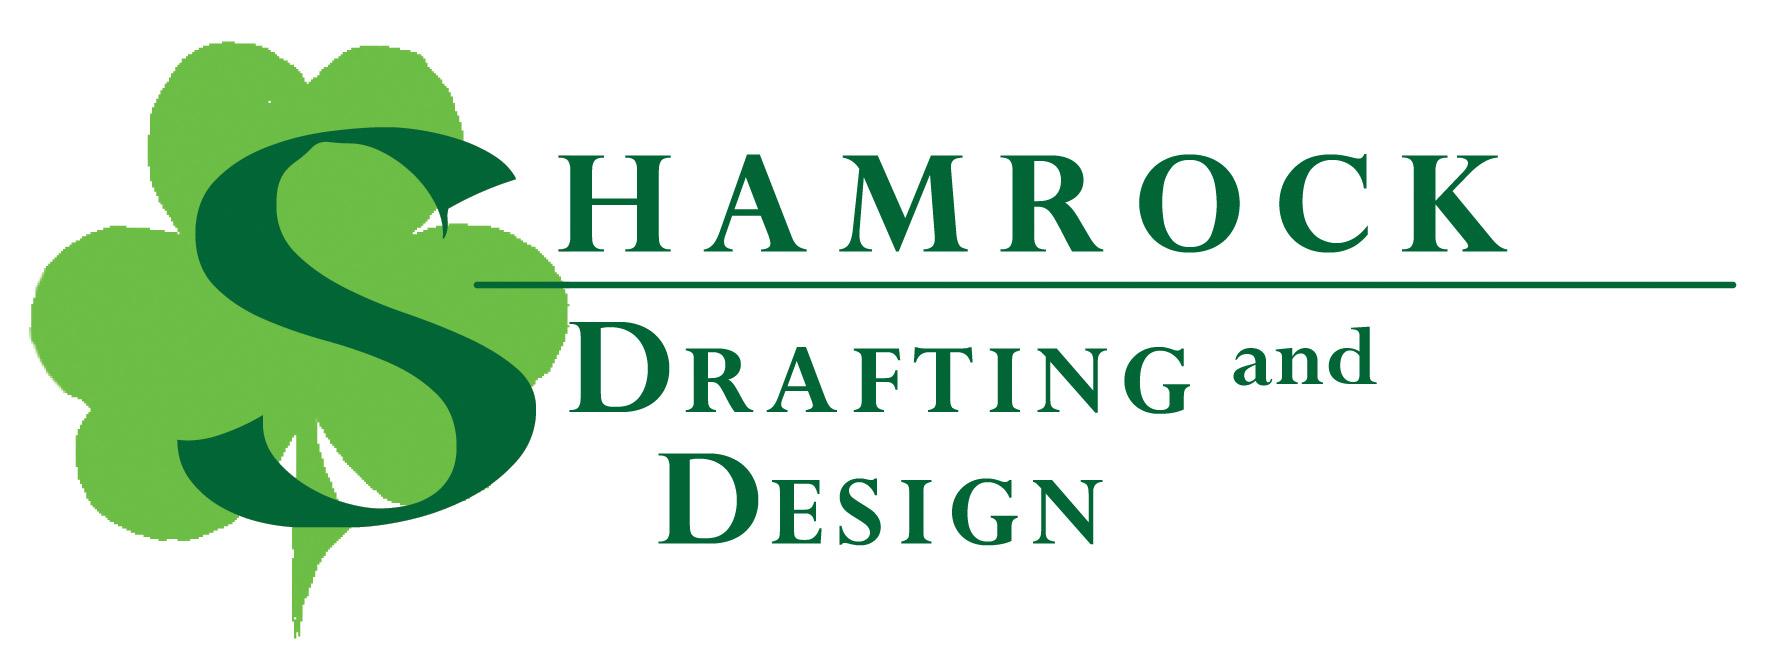 Shamrock Drafting and Design